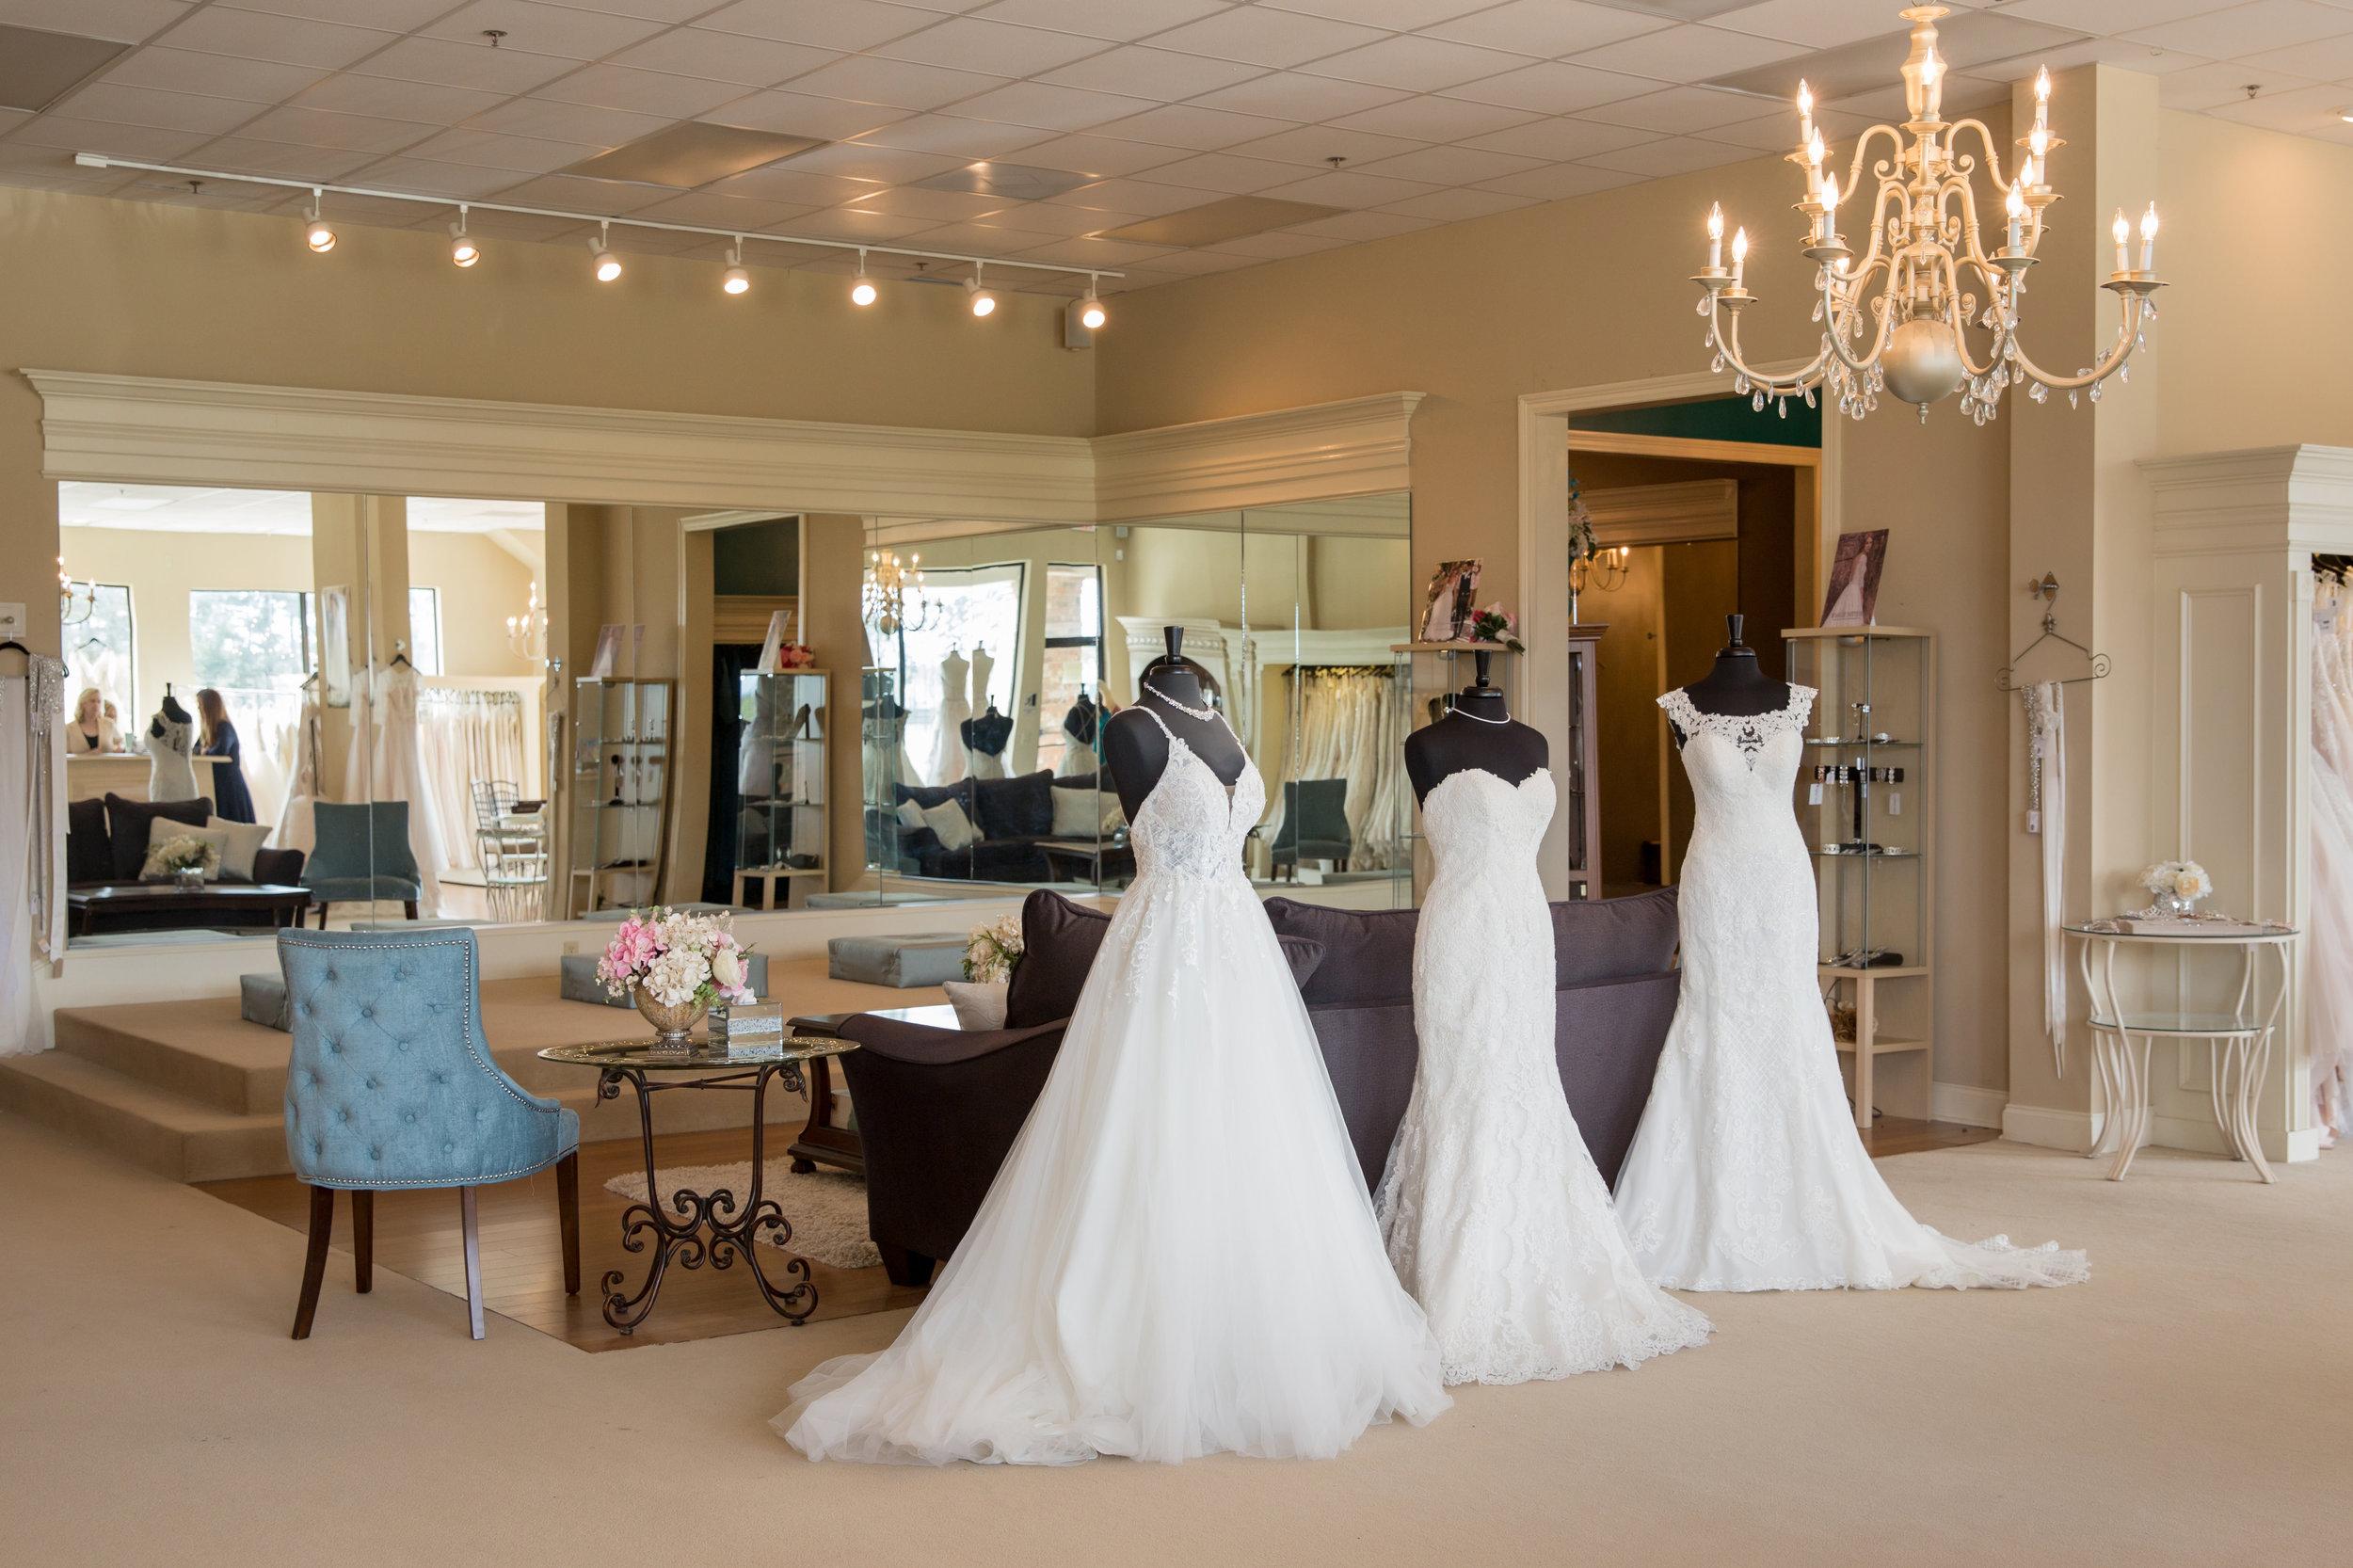 Baton Rouge Wedding Dress - 9